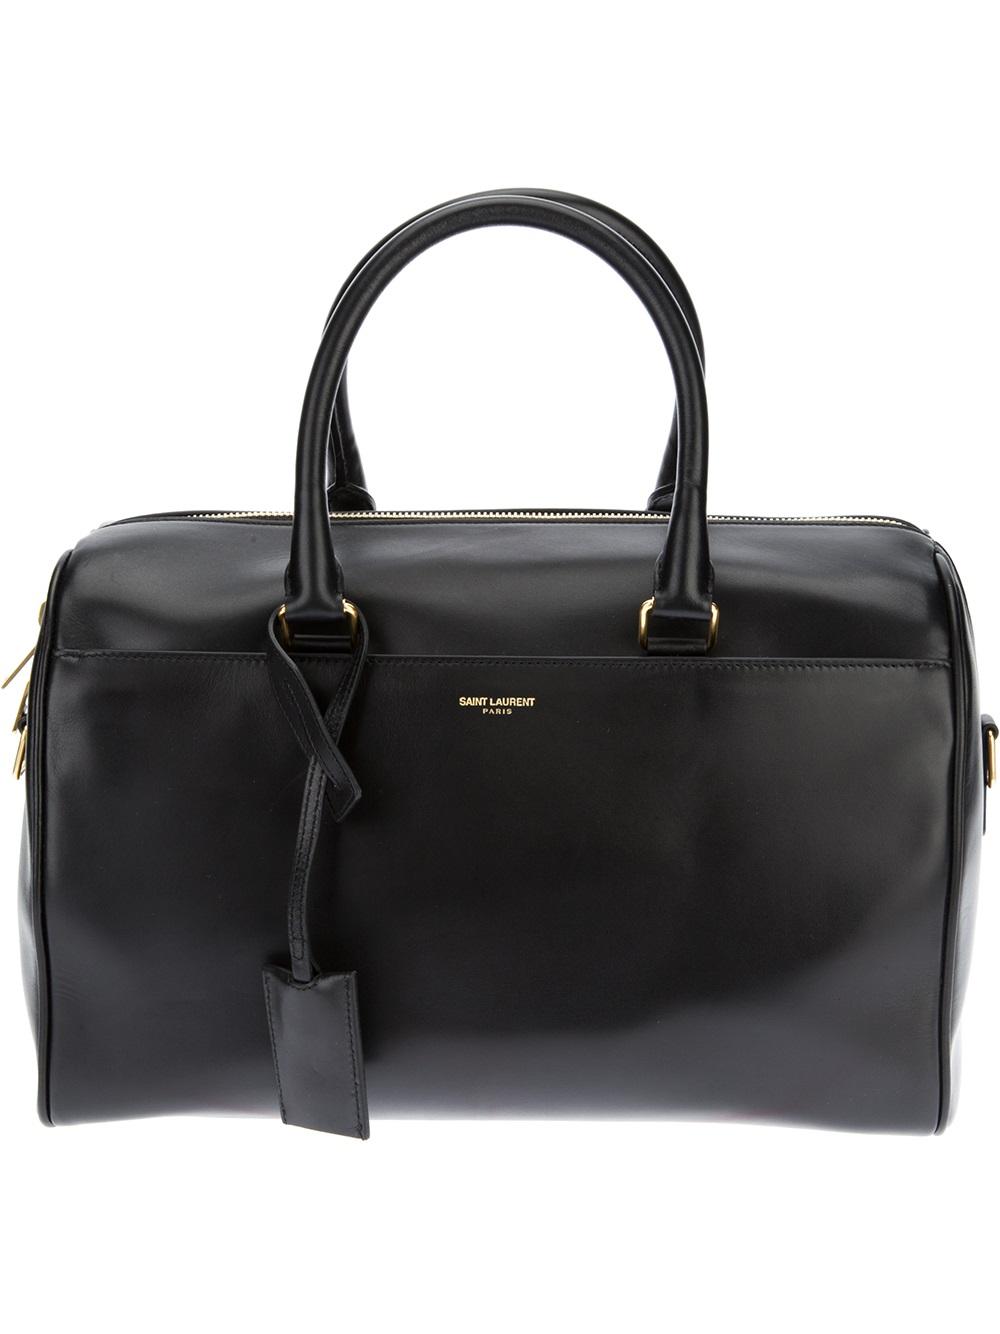 saint laurent classic duffle bag in black